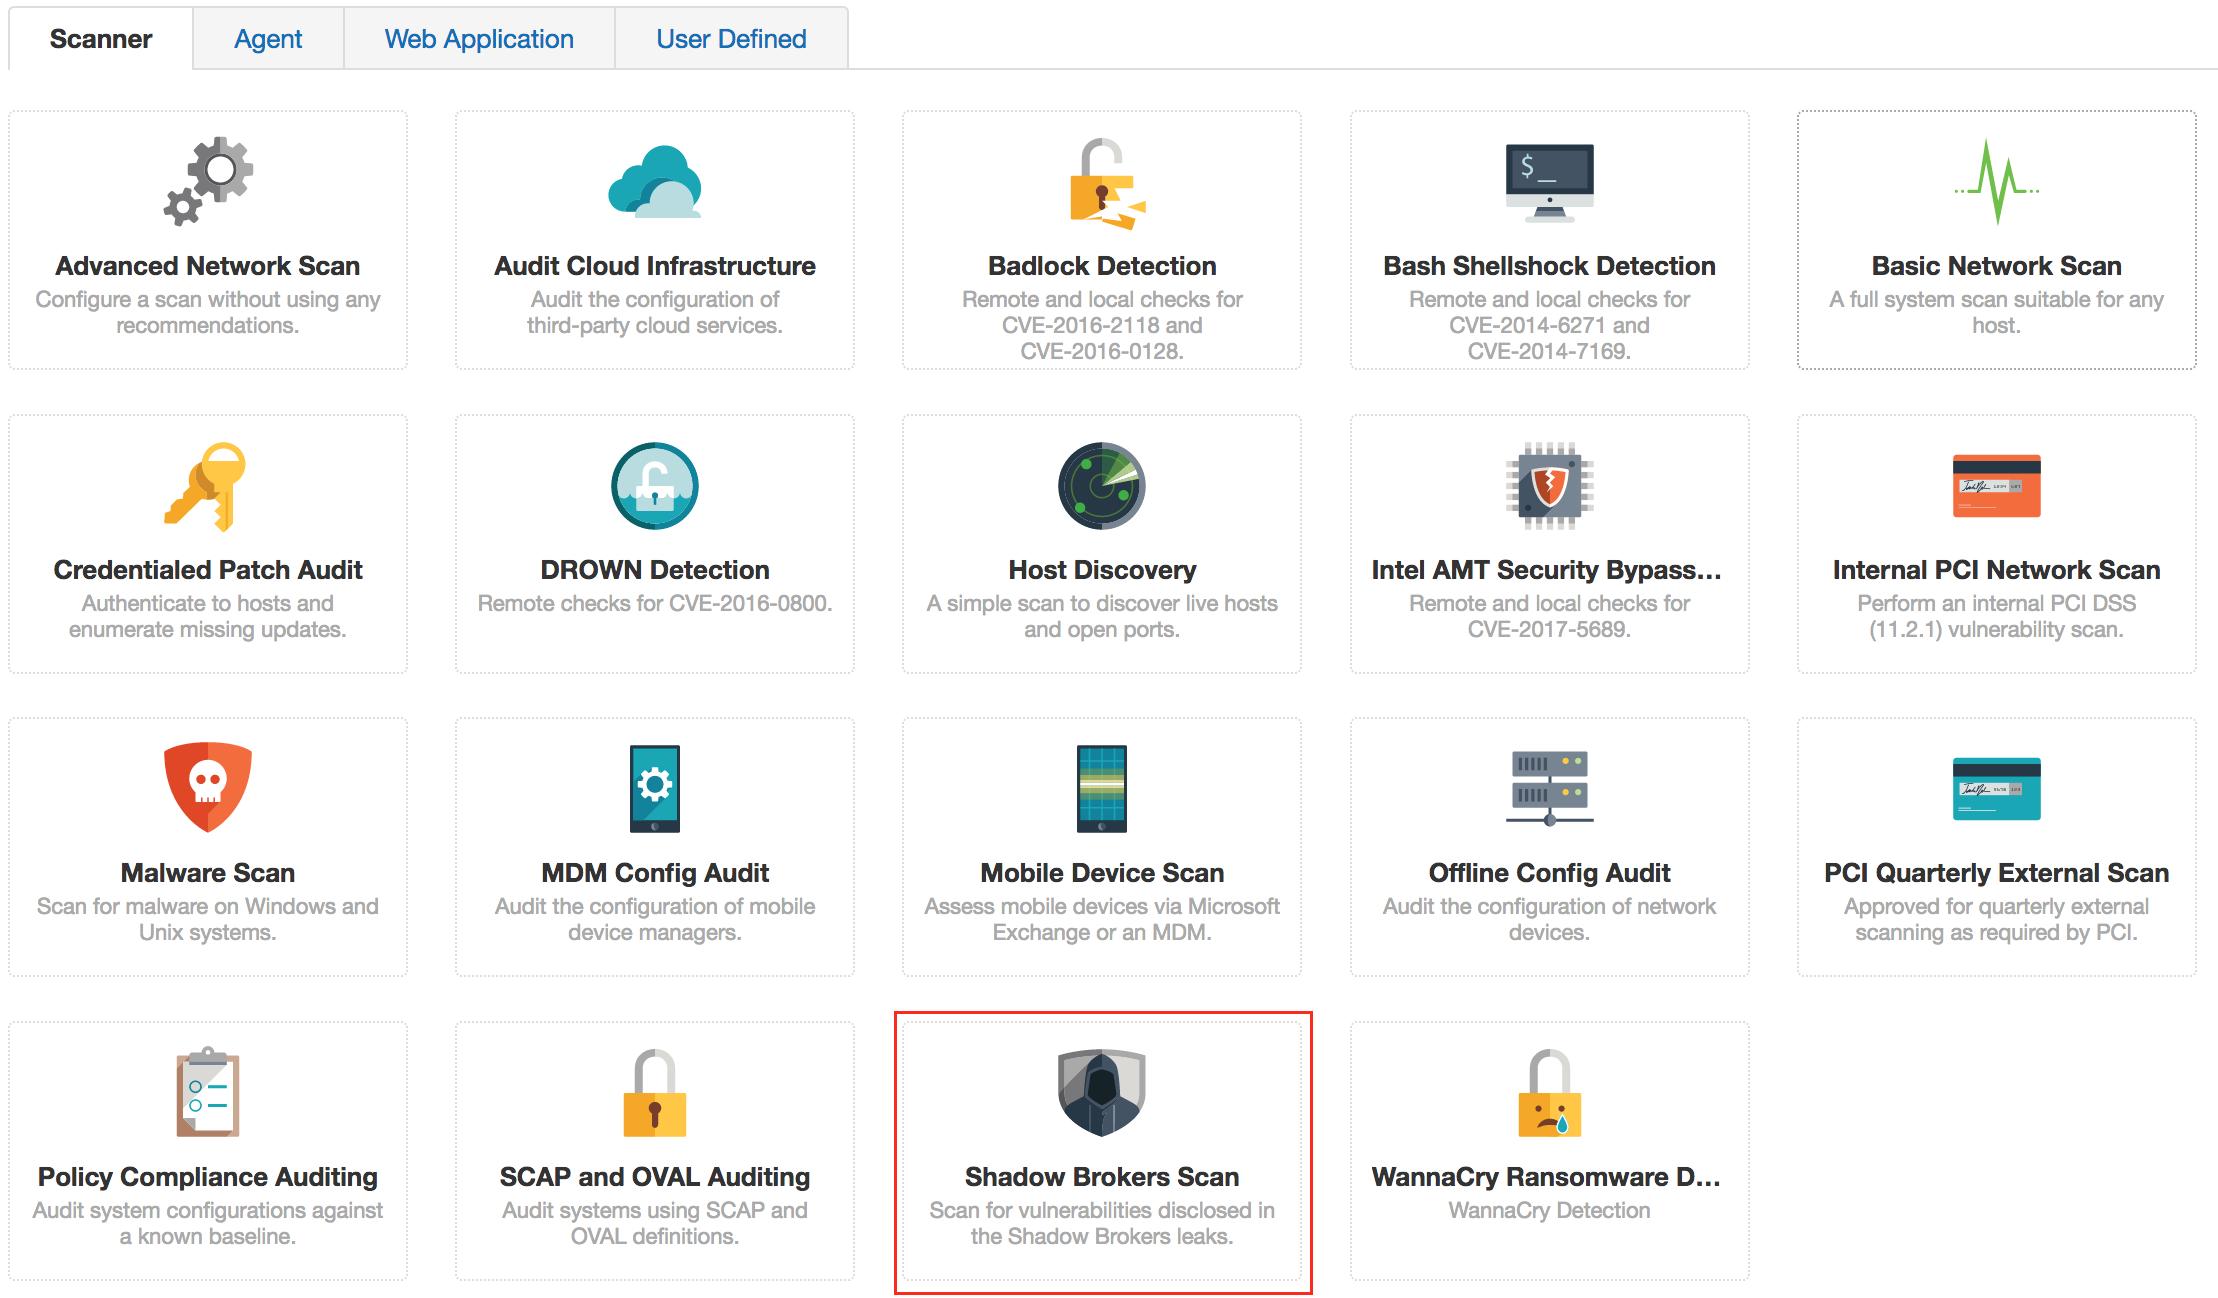 Tenable.io scan template for Shadow Brokers vulnerabilities